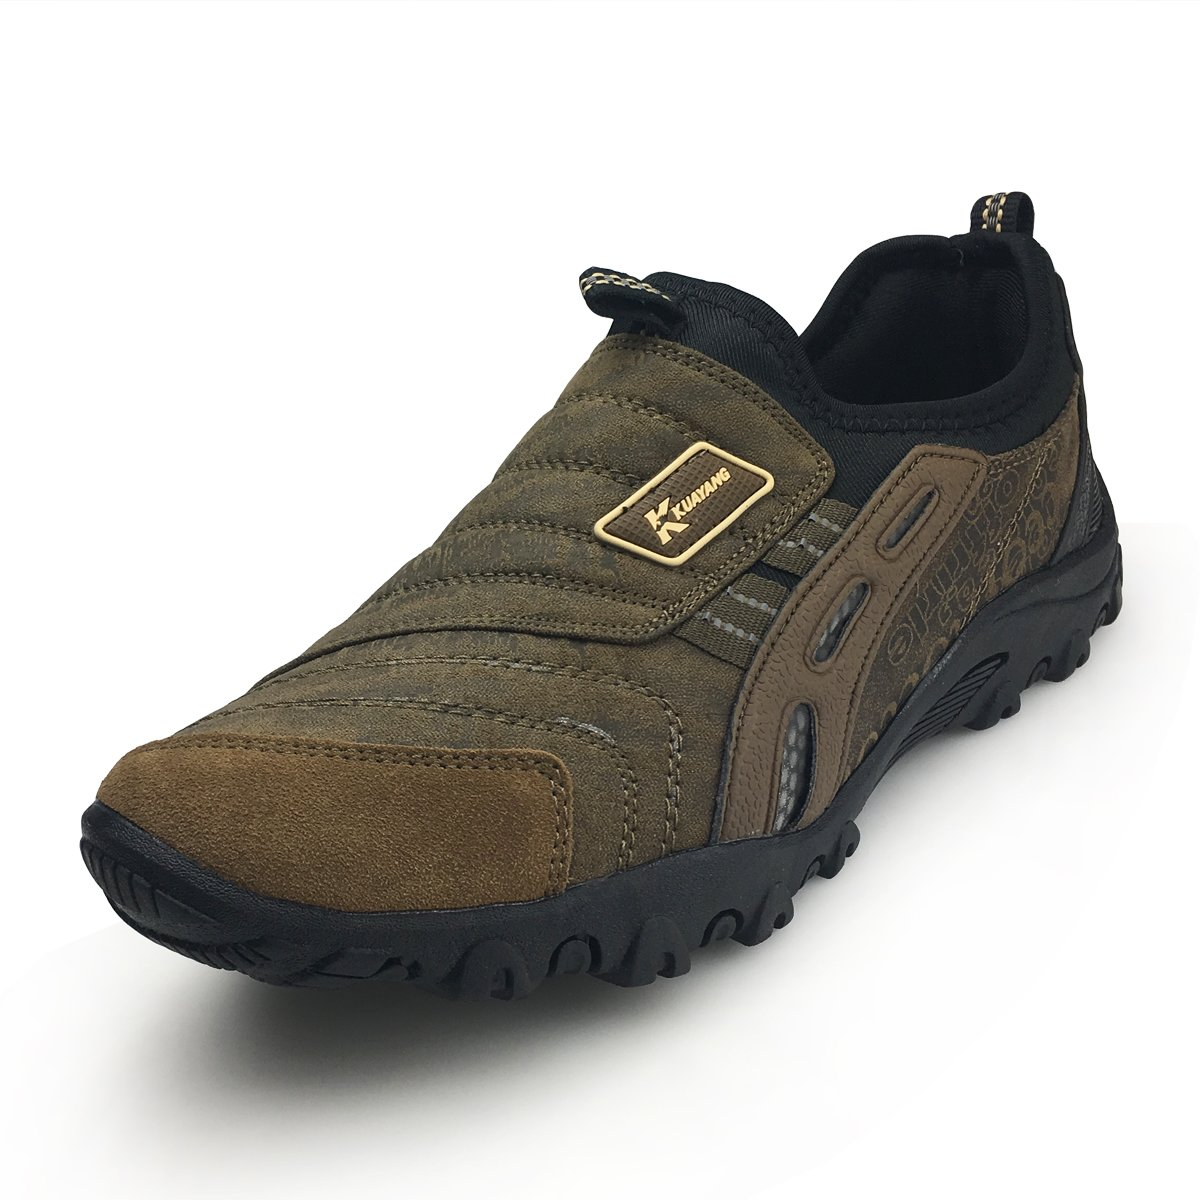 XiaoYouYu Men Slip On Sneaker - Outdoor Hiking Shoe Sport Trail Running Shoes Casual Trekking Shoes AAX004 Brown, 9 D(M) US